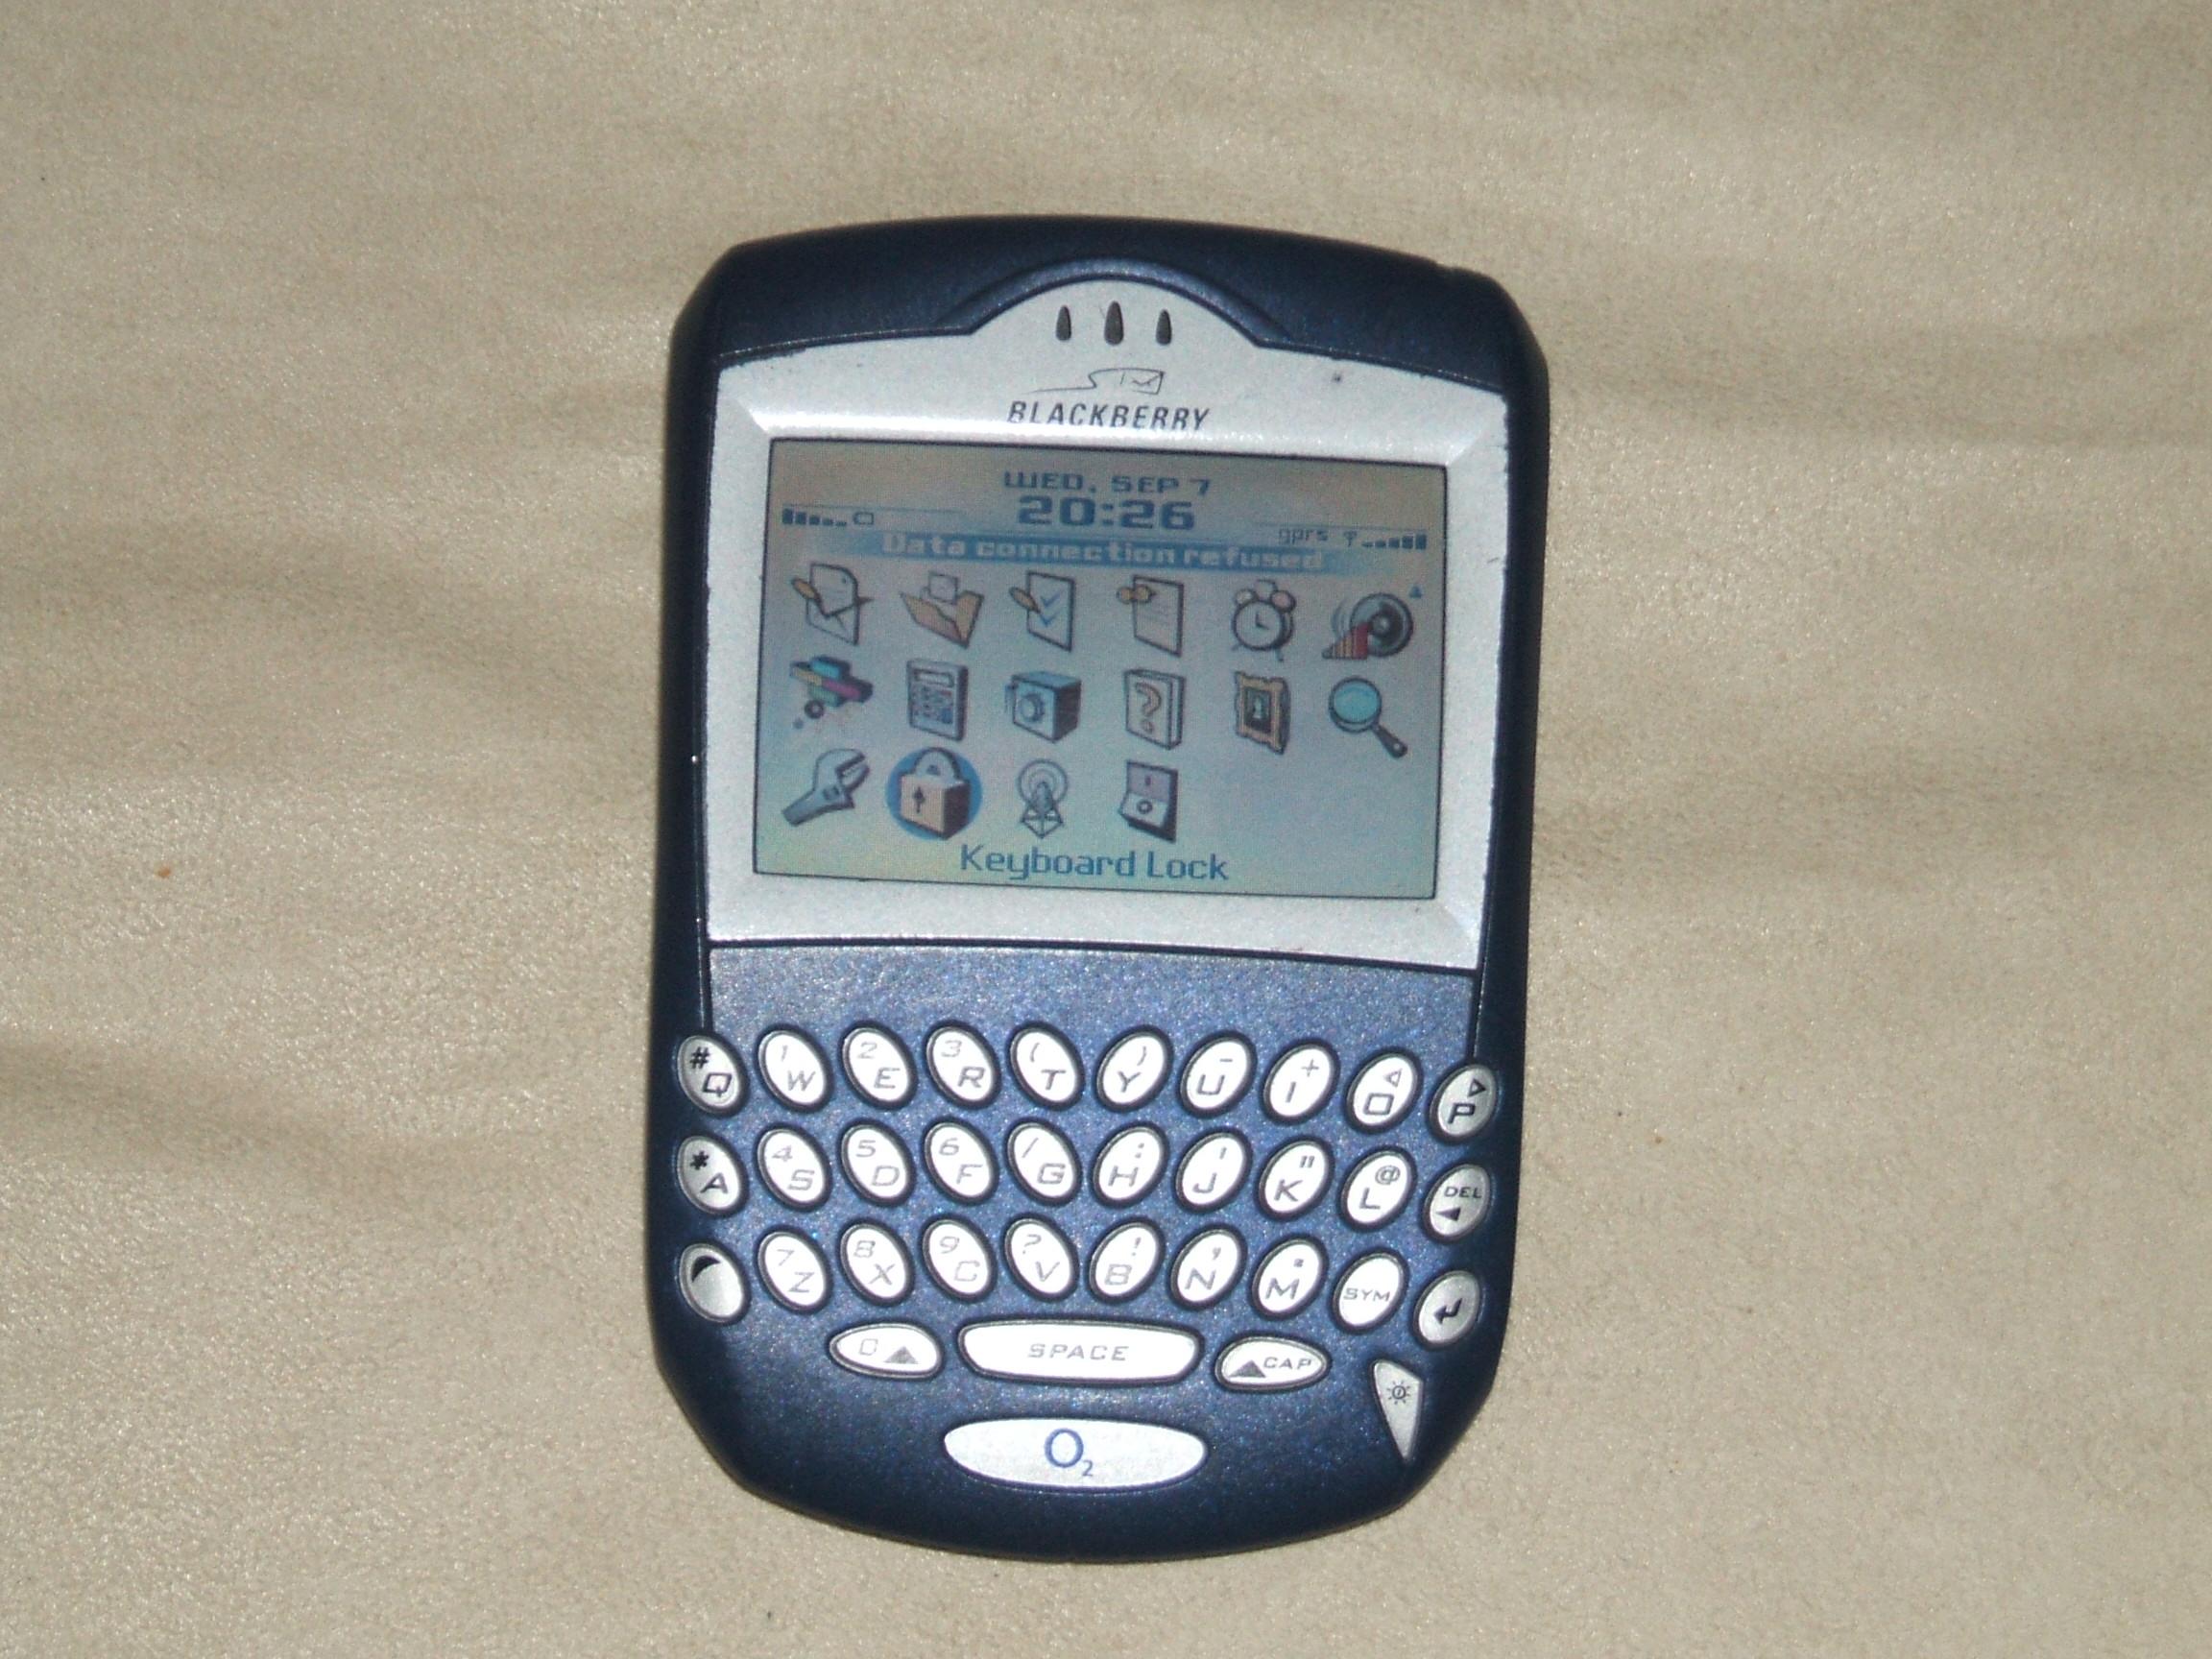 blackberry 7230 for sale classifieds forum manx forums live rh manxforums com BlackBerry Curve Purple BlackBerry Tour